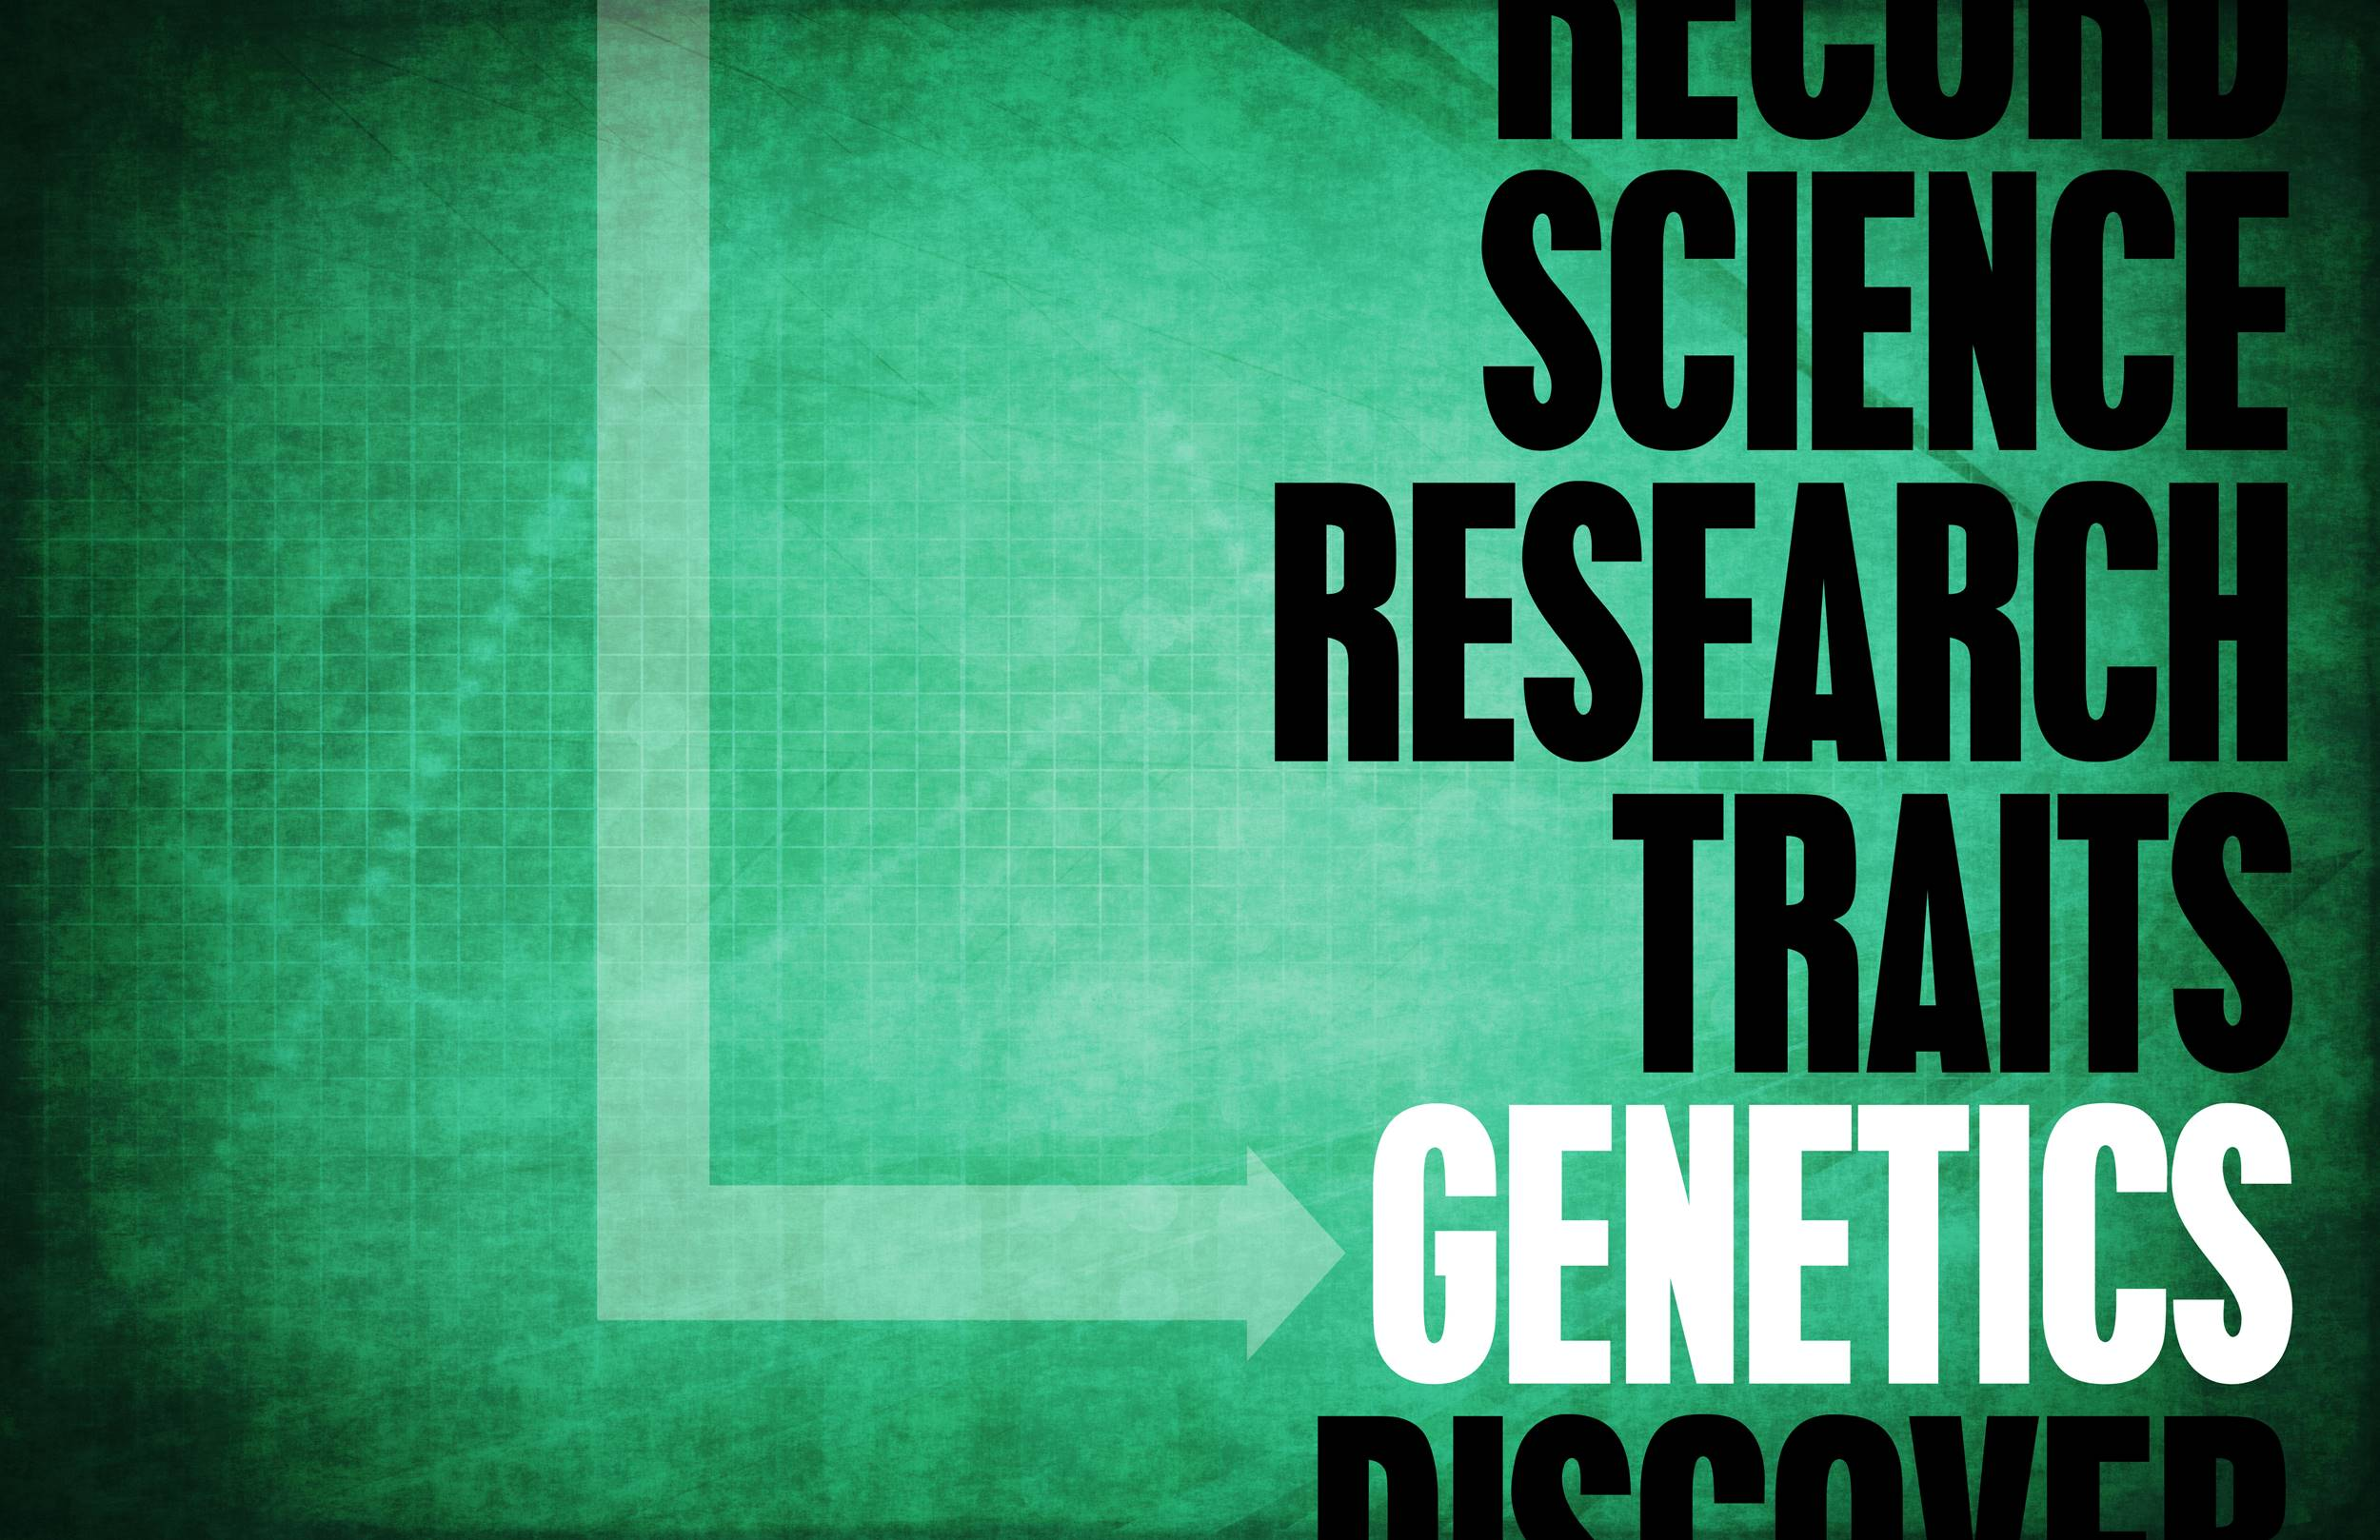 examens génétiques